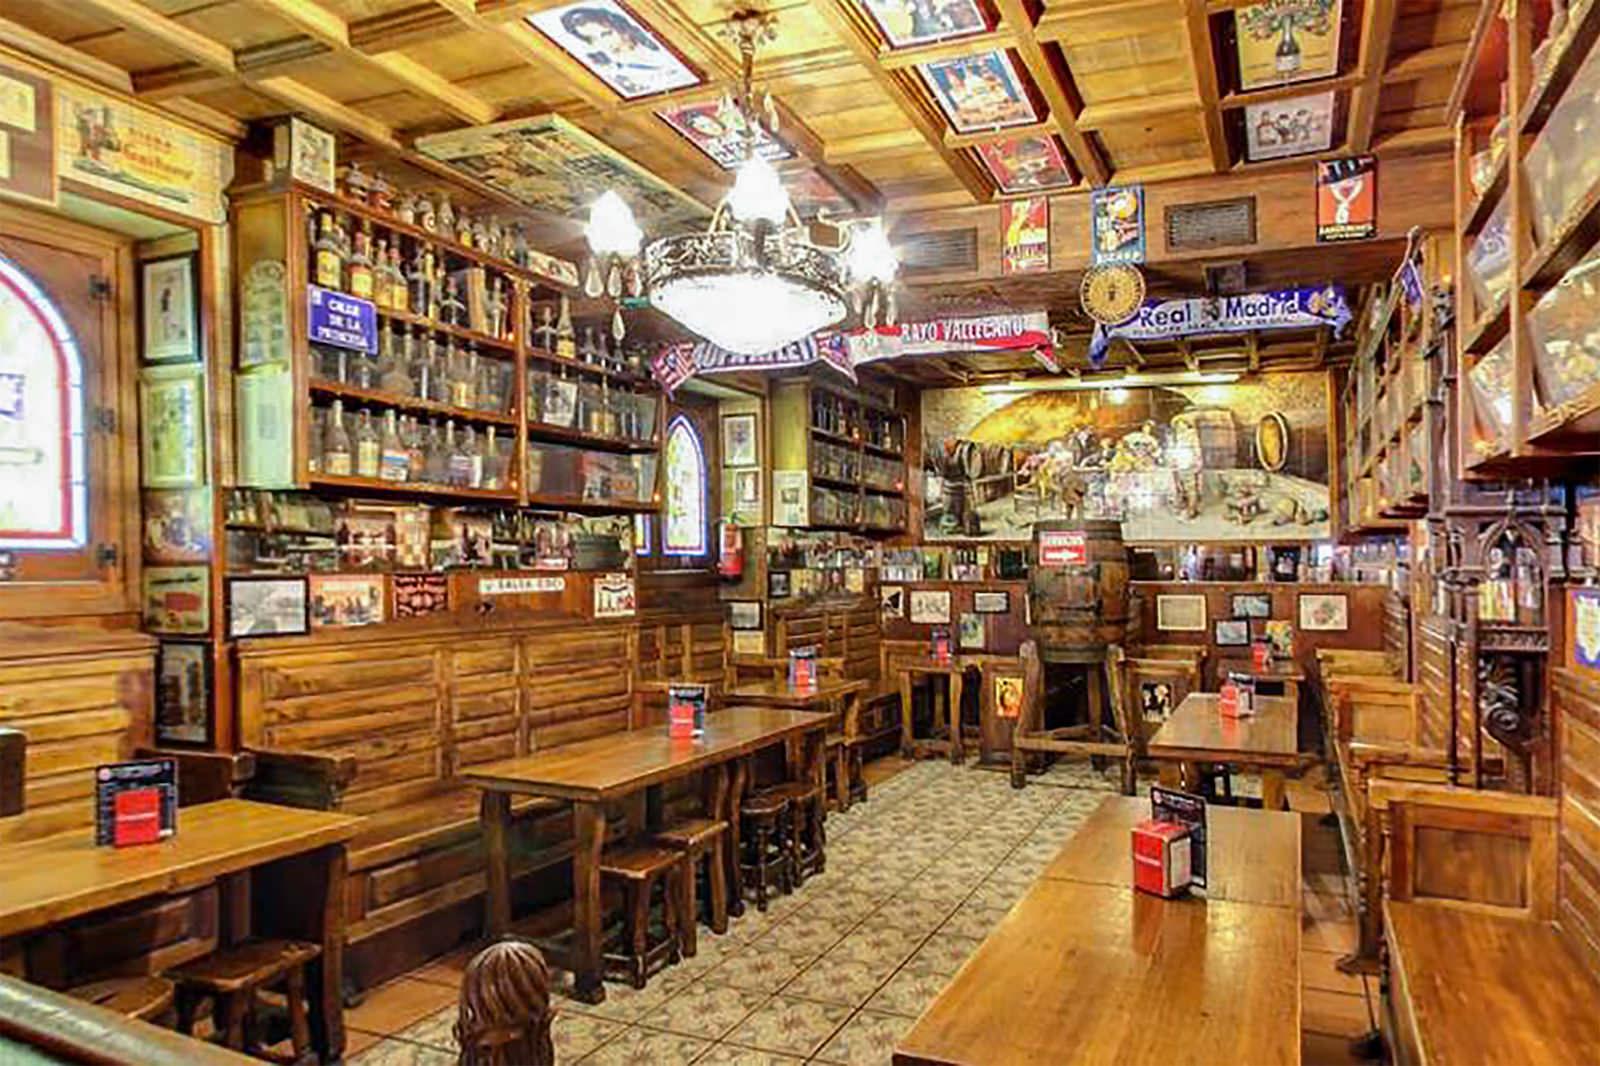 Madrid cool blog taberna angel sierra interior g madrid cool blog - Tiendas de muebles en madrid sur ...